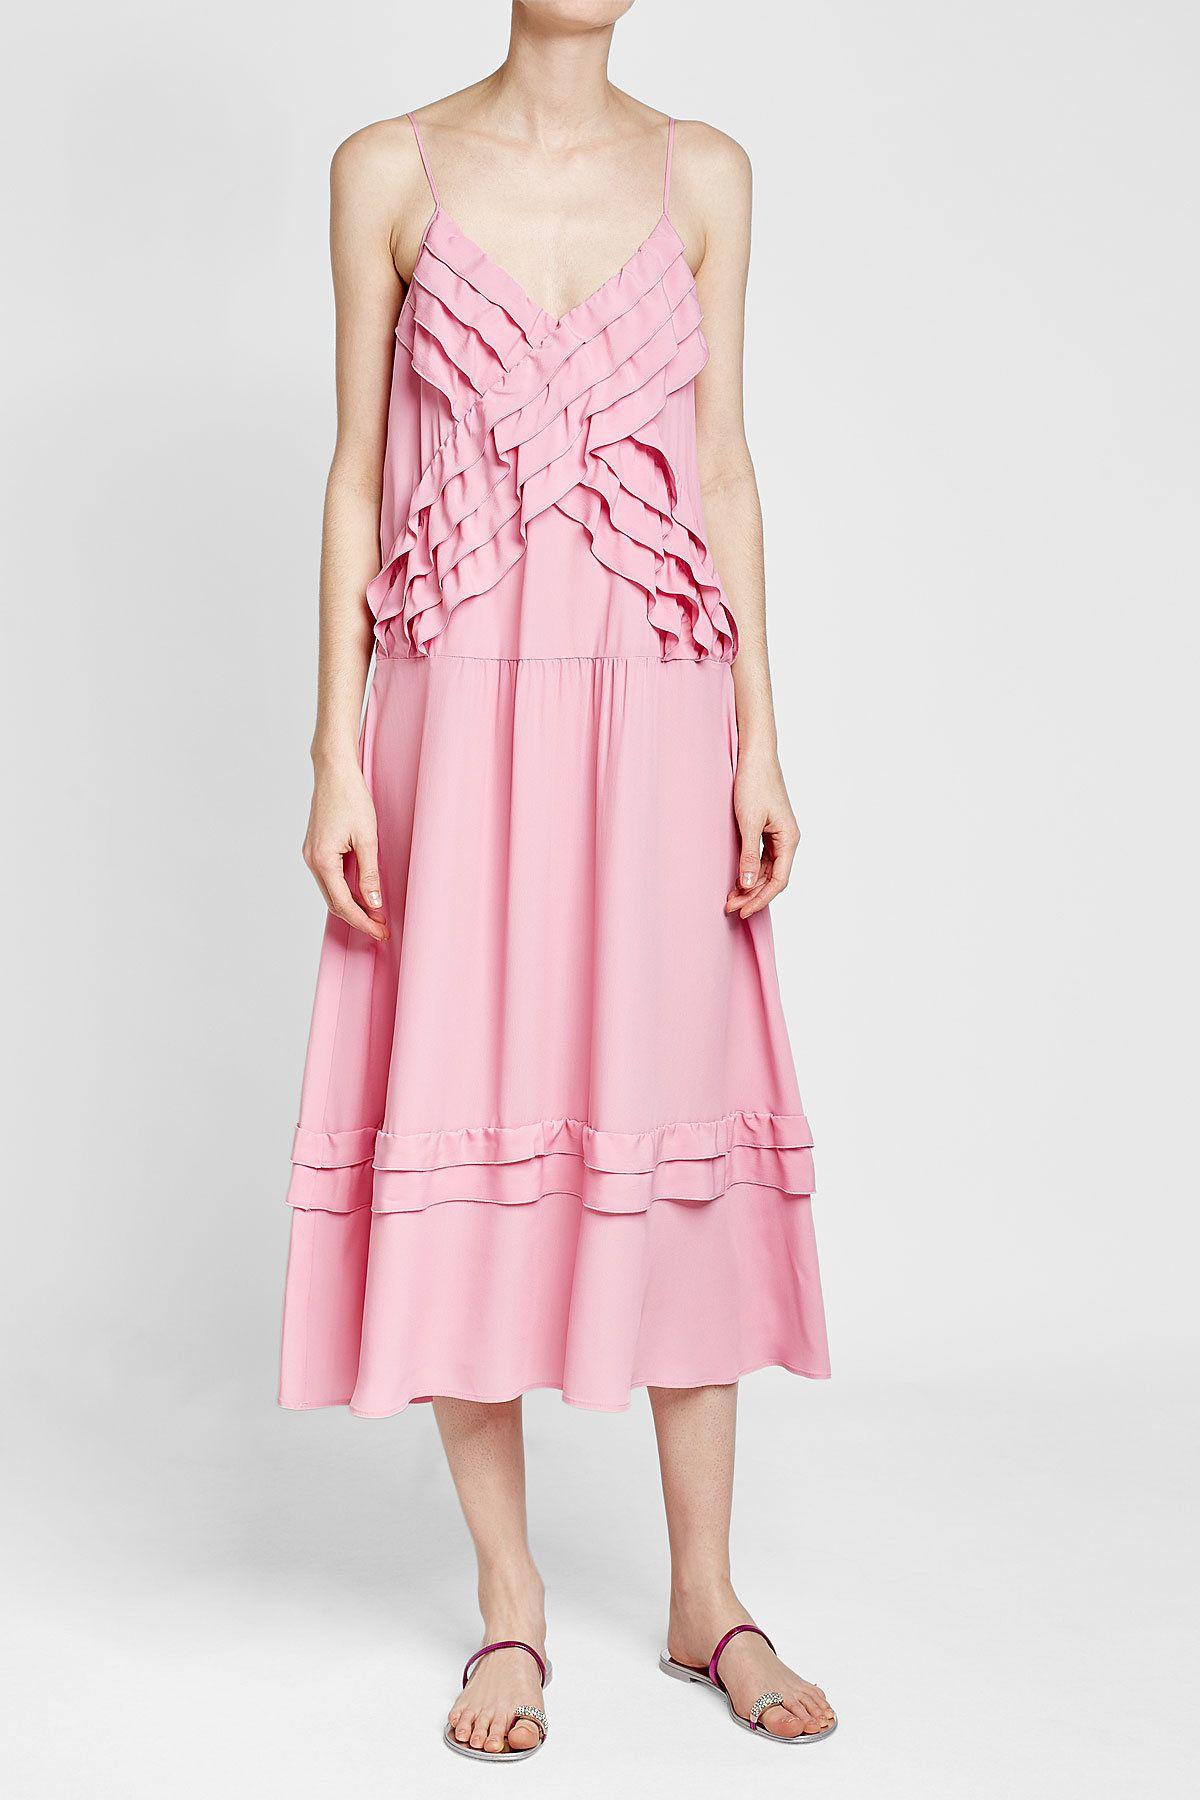 N°21 - Ruffle Maxi Dress | STYLEBOP